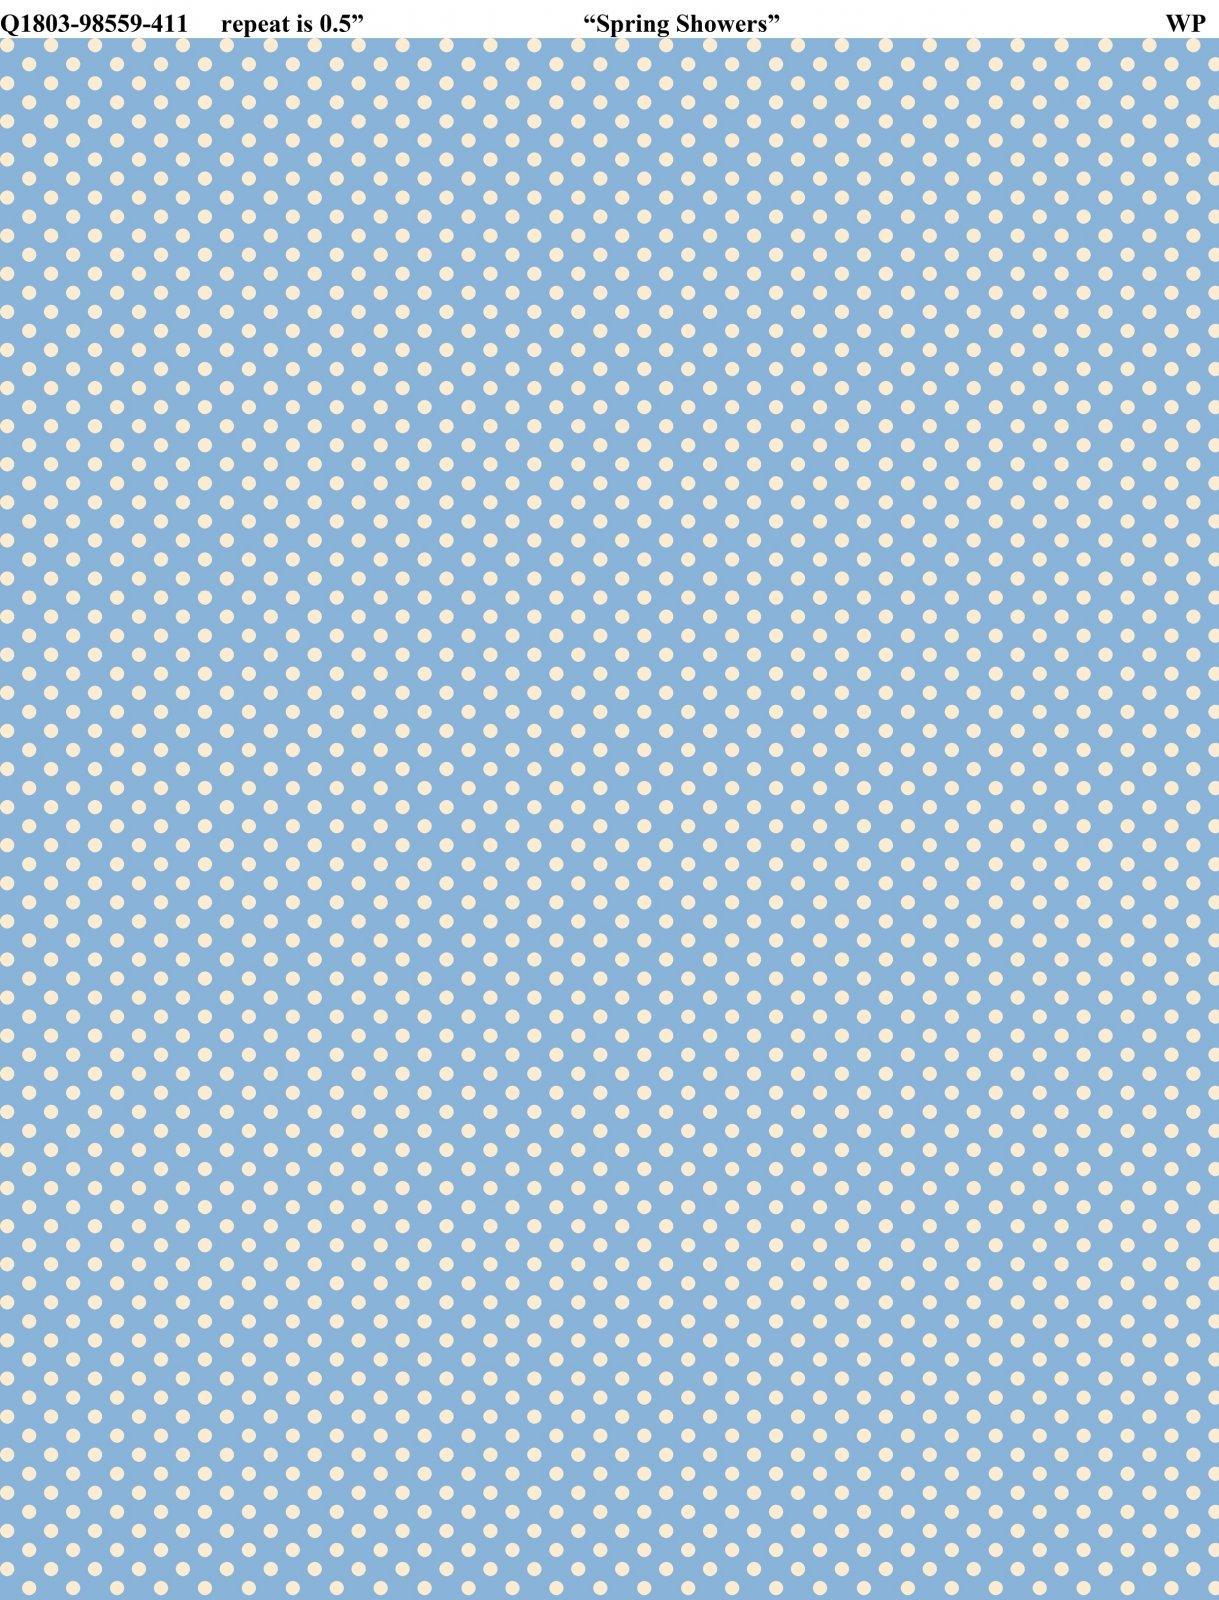 Backyard Pals - white dots on blue